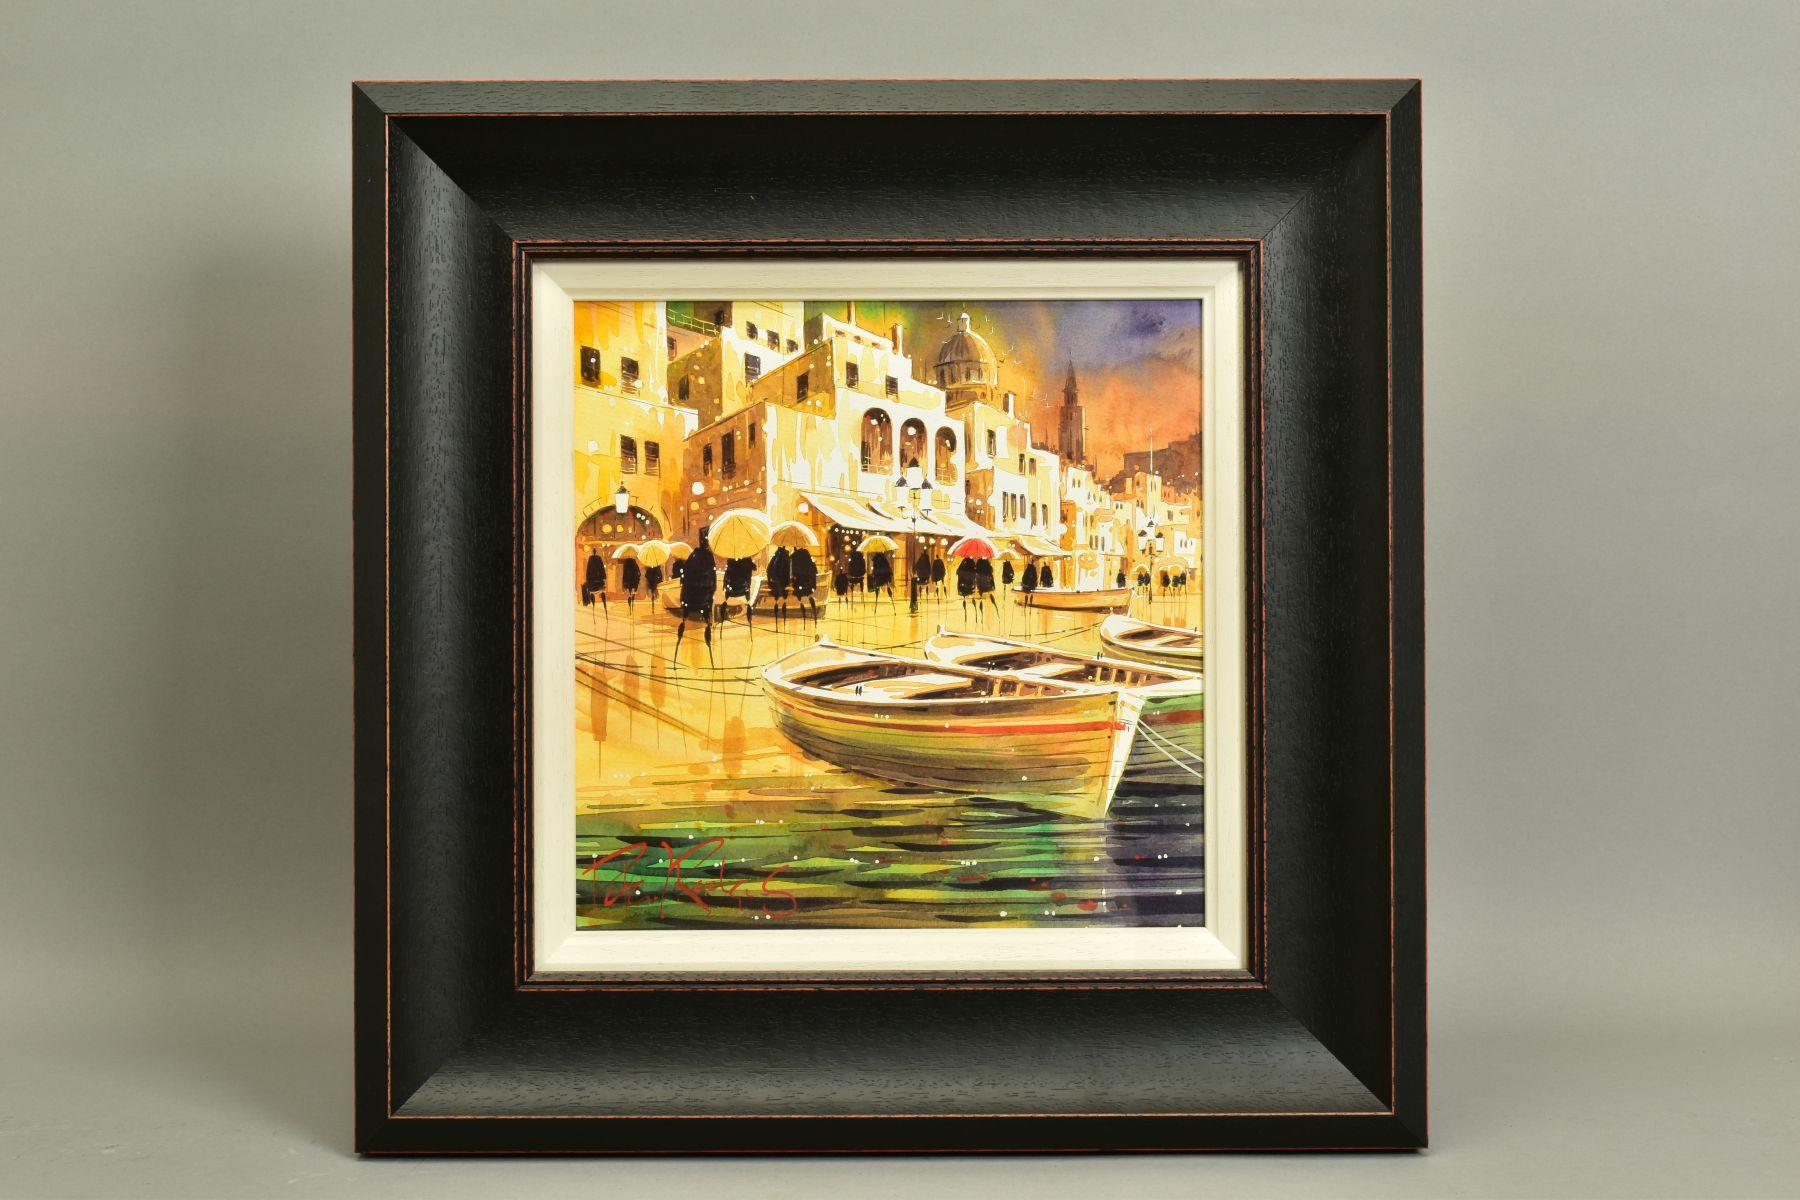 PETER J. RODGERS (BRITISH CONTEMPORARY), 'Reflections, Naples', an Italian Promenade on a rainy